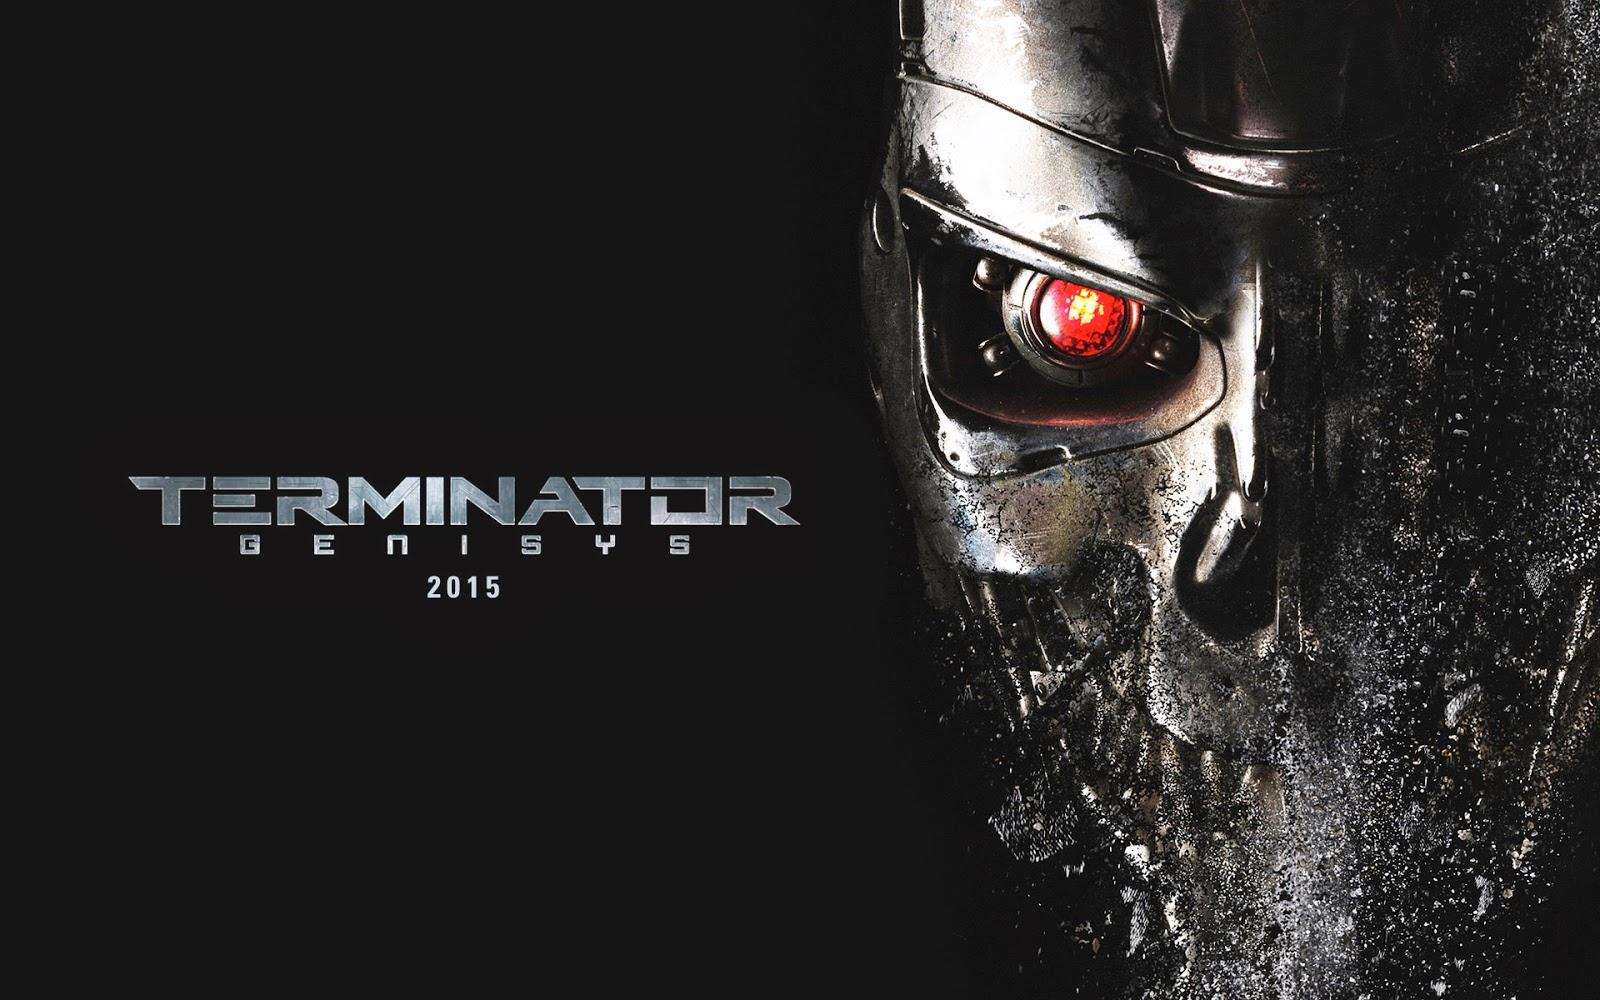 Terminator Genisys 2015 Wallpaper - KFZoom